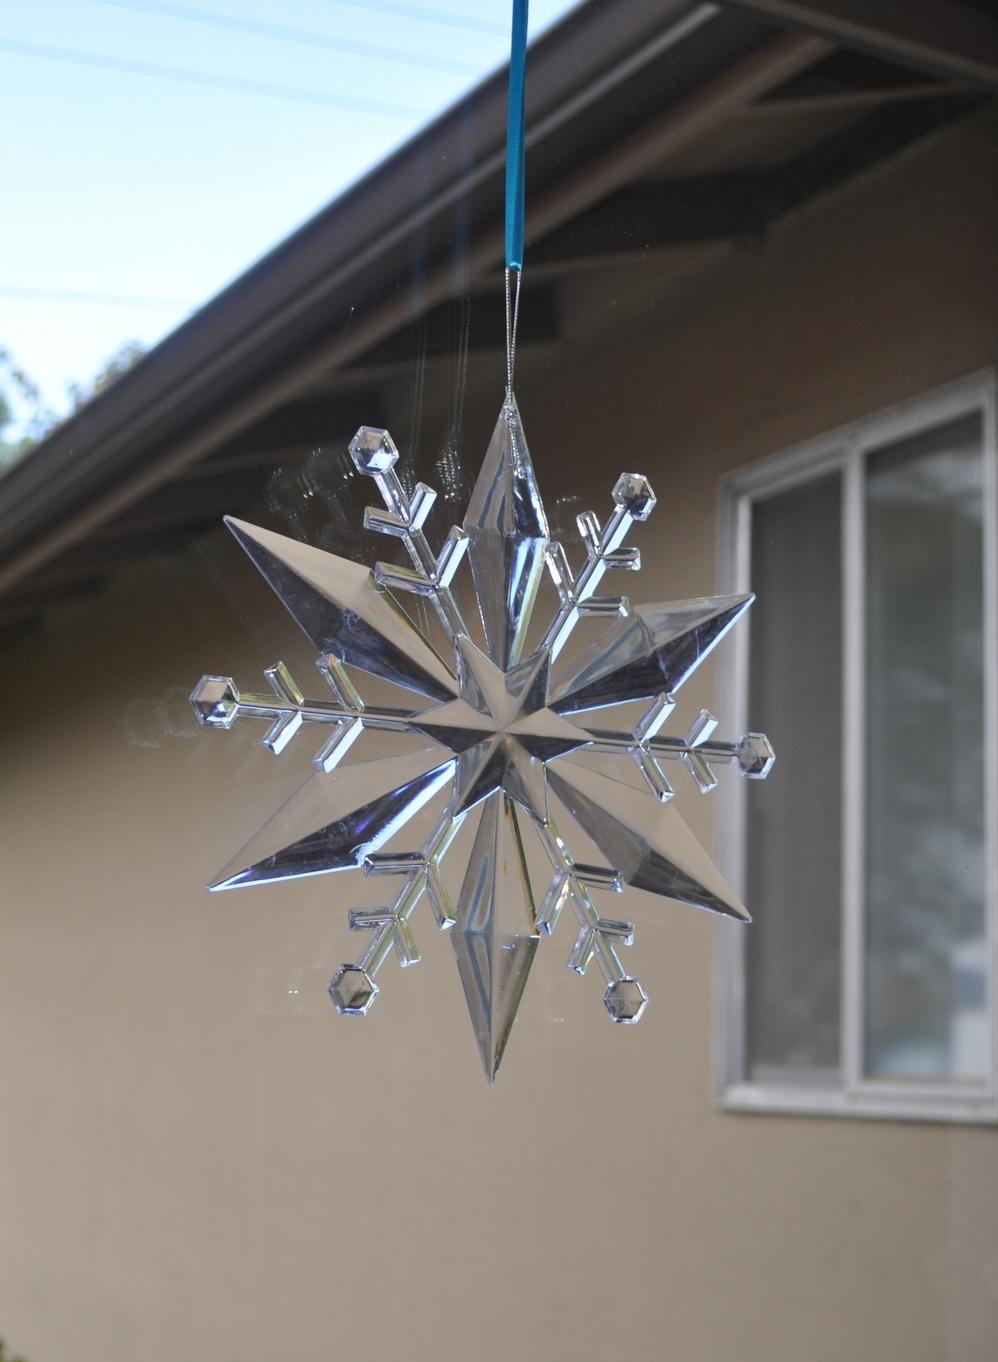 A Dollar Store snowflake